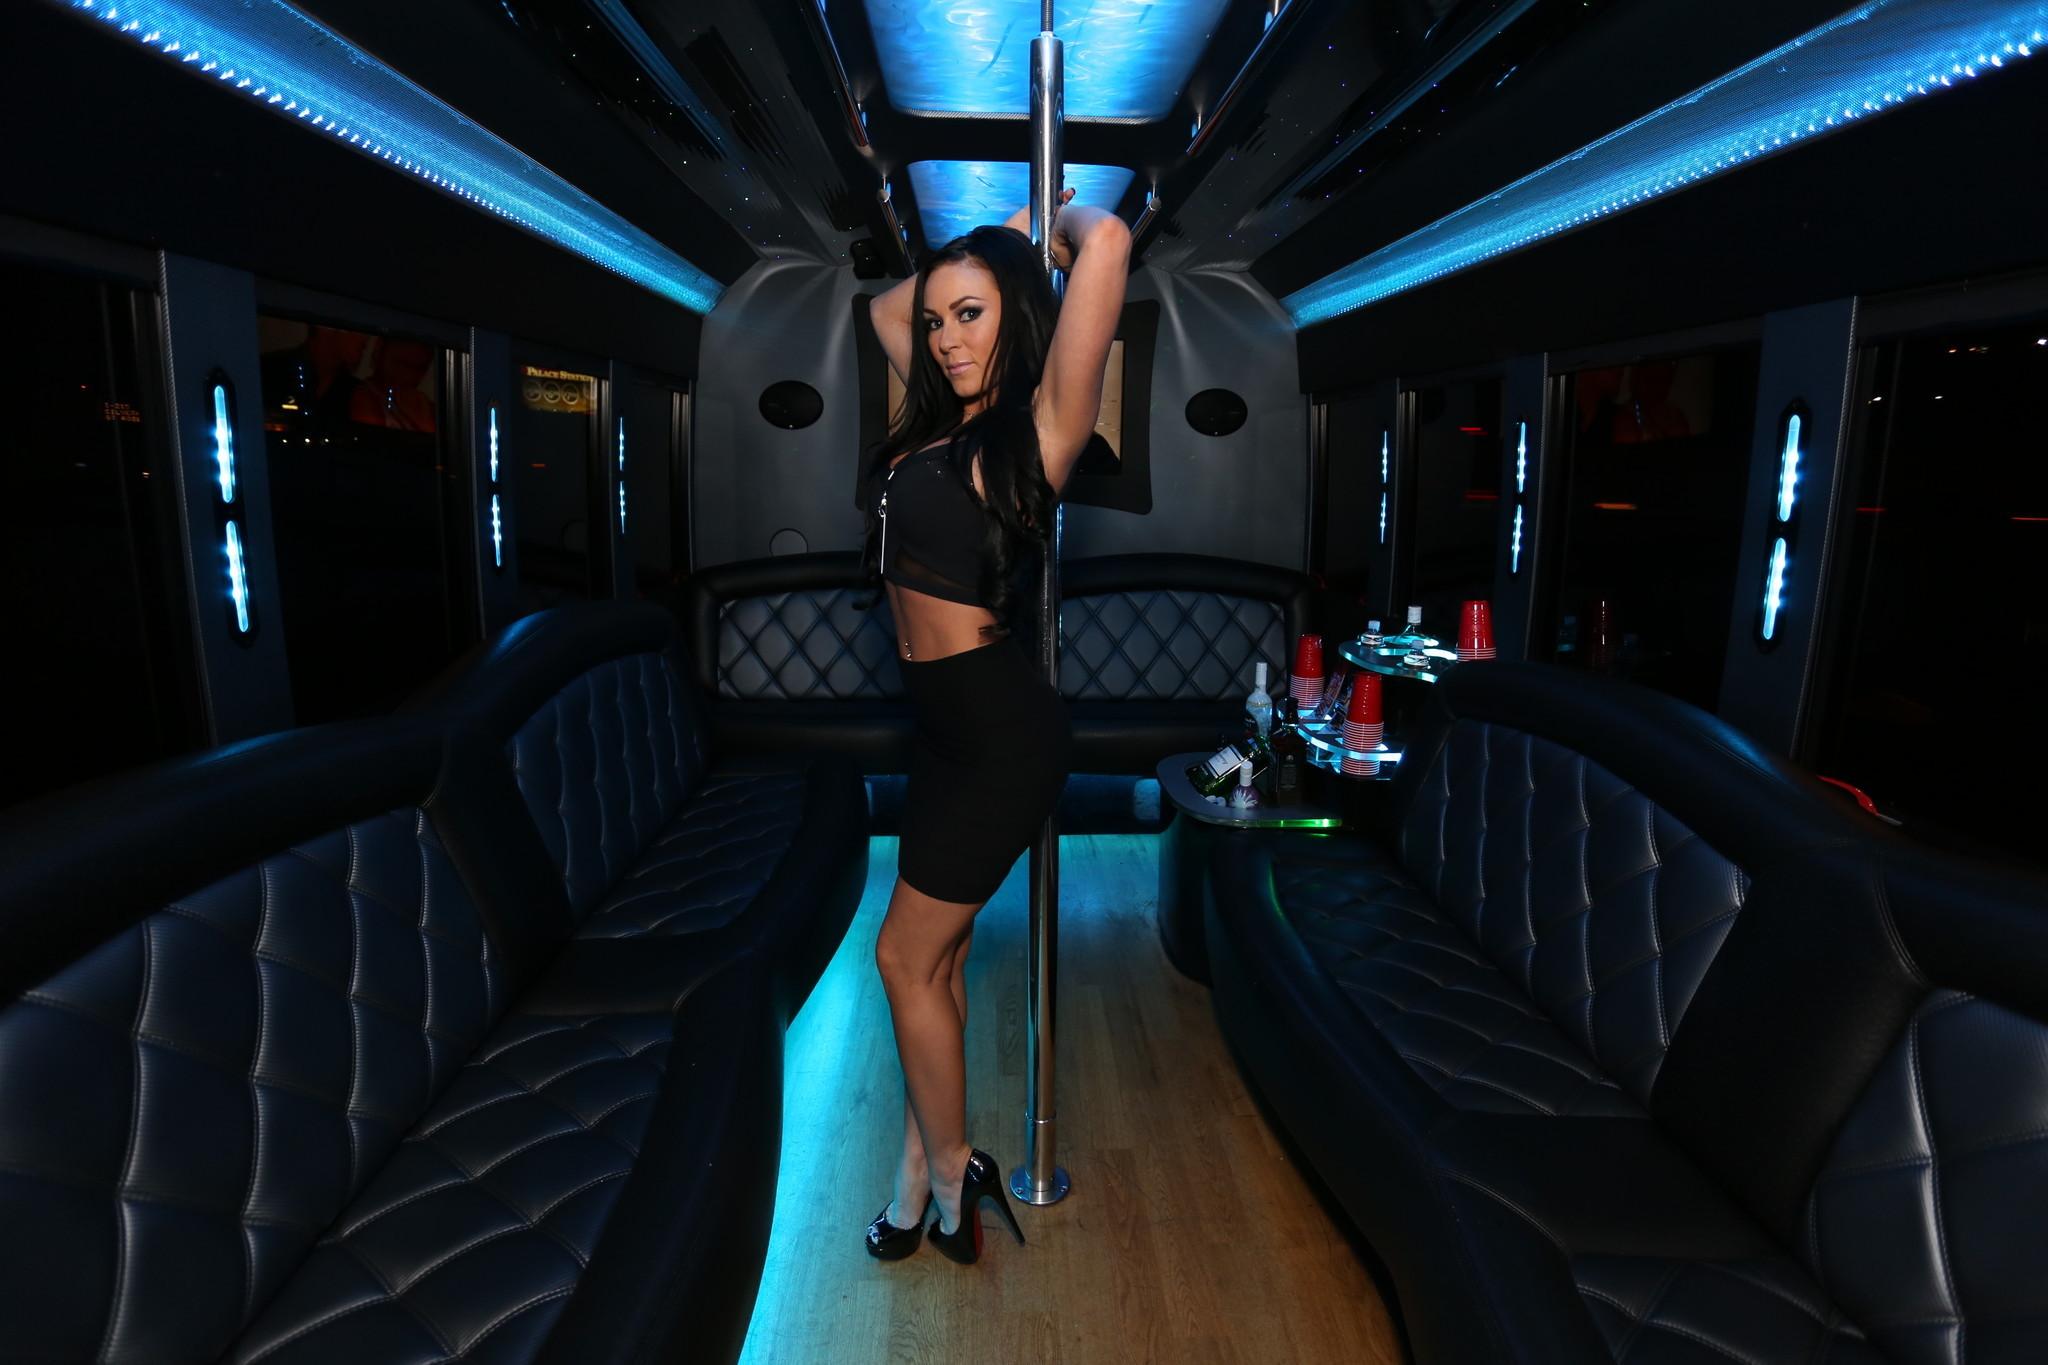 Bus Tours From Las Vegas To La